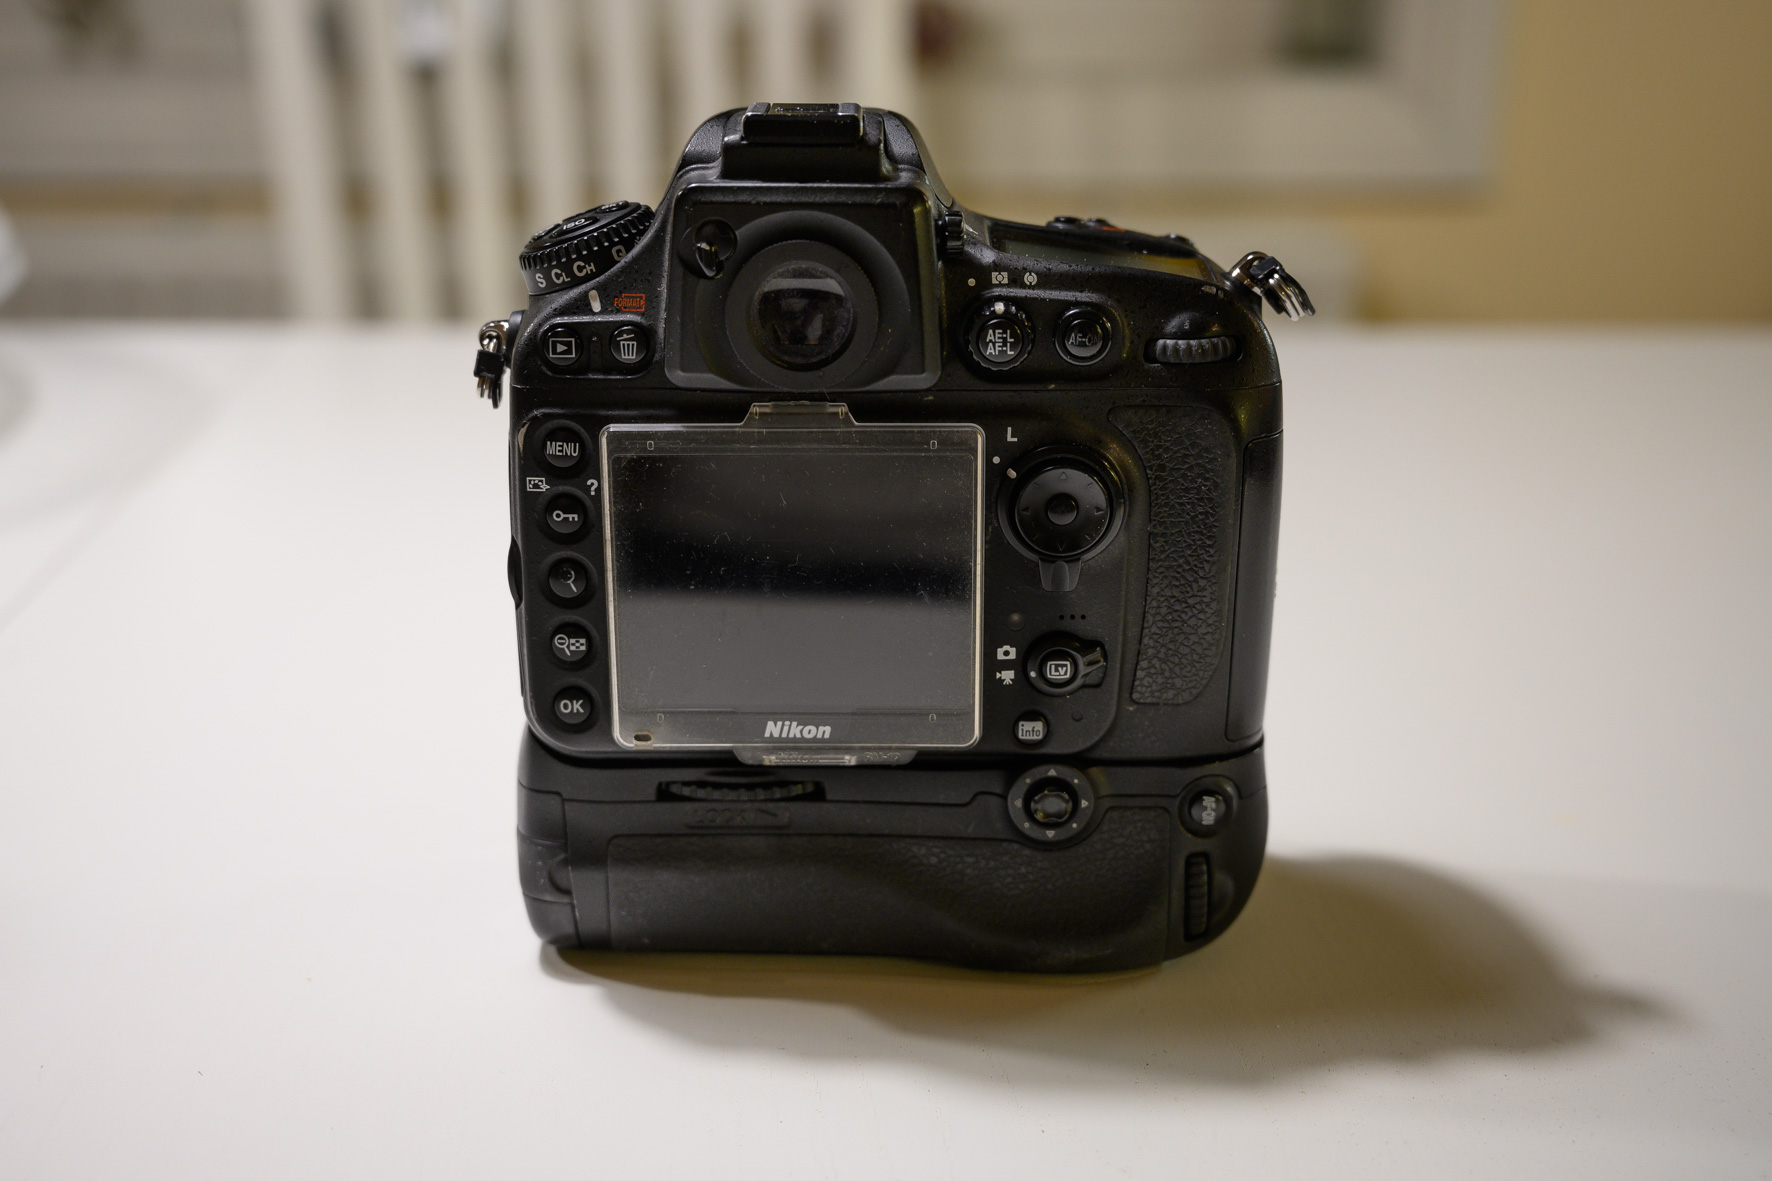 Nikon D800 002.JPG